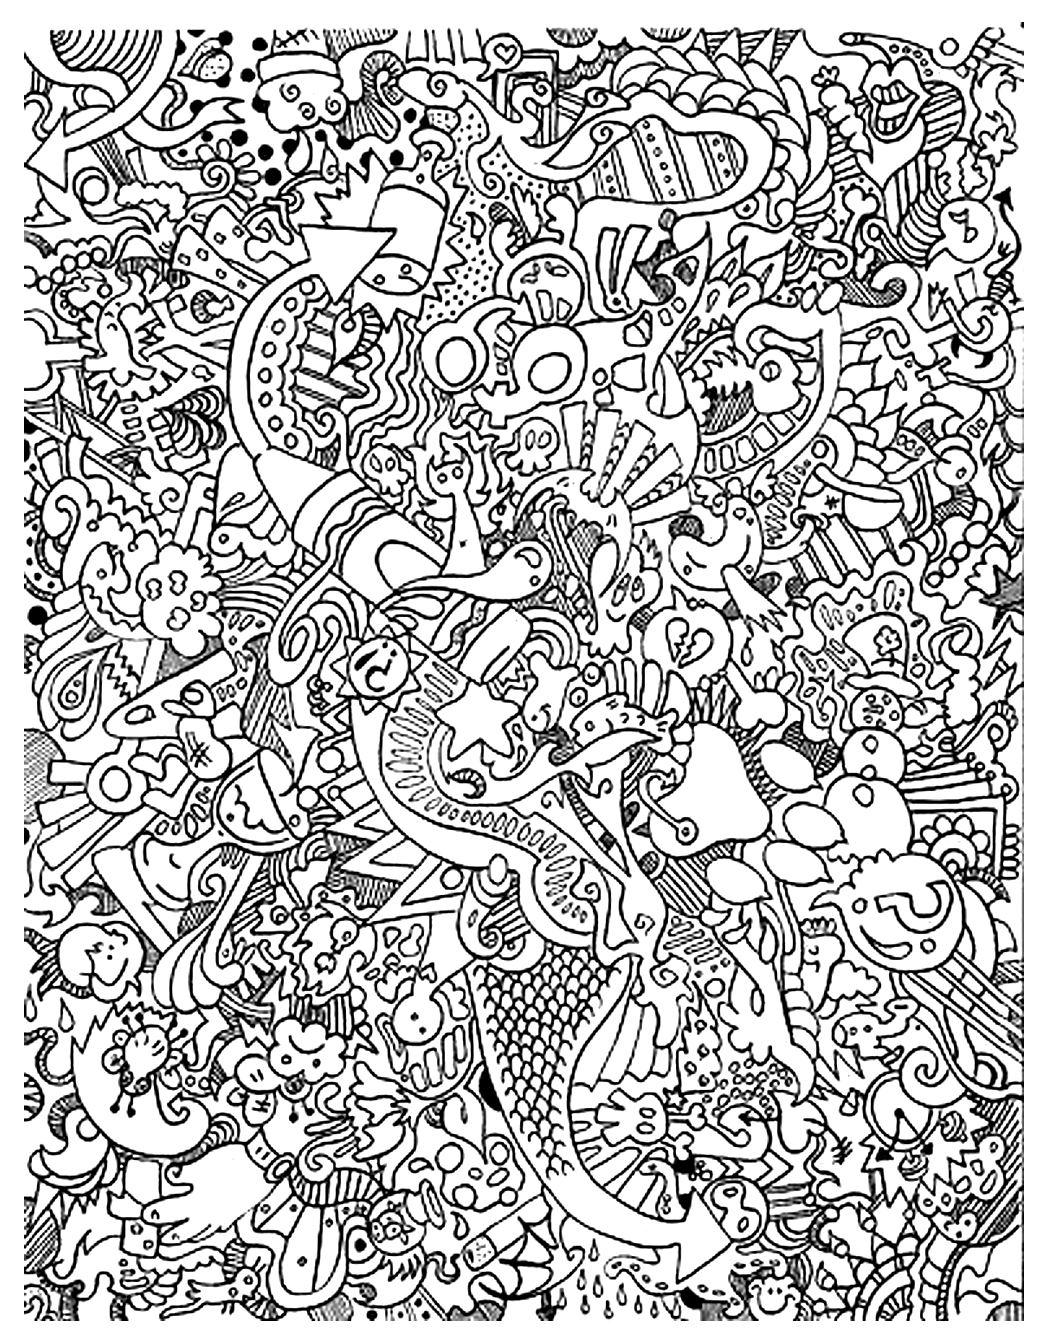 Big mess - Image with : Imaginary world